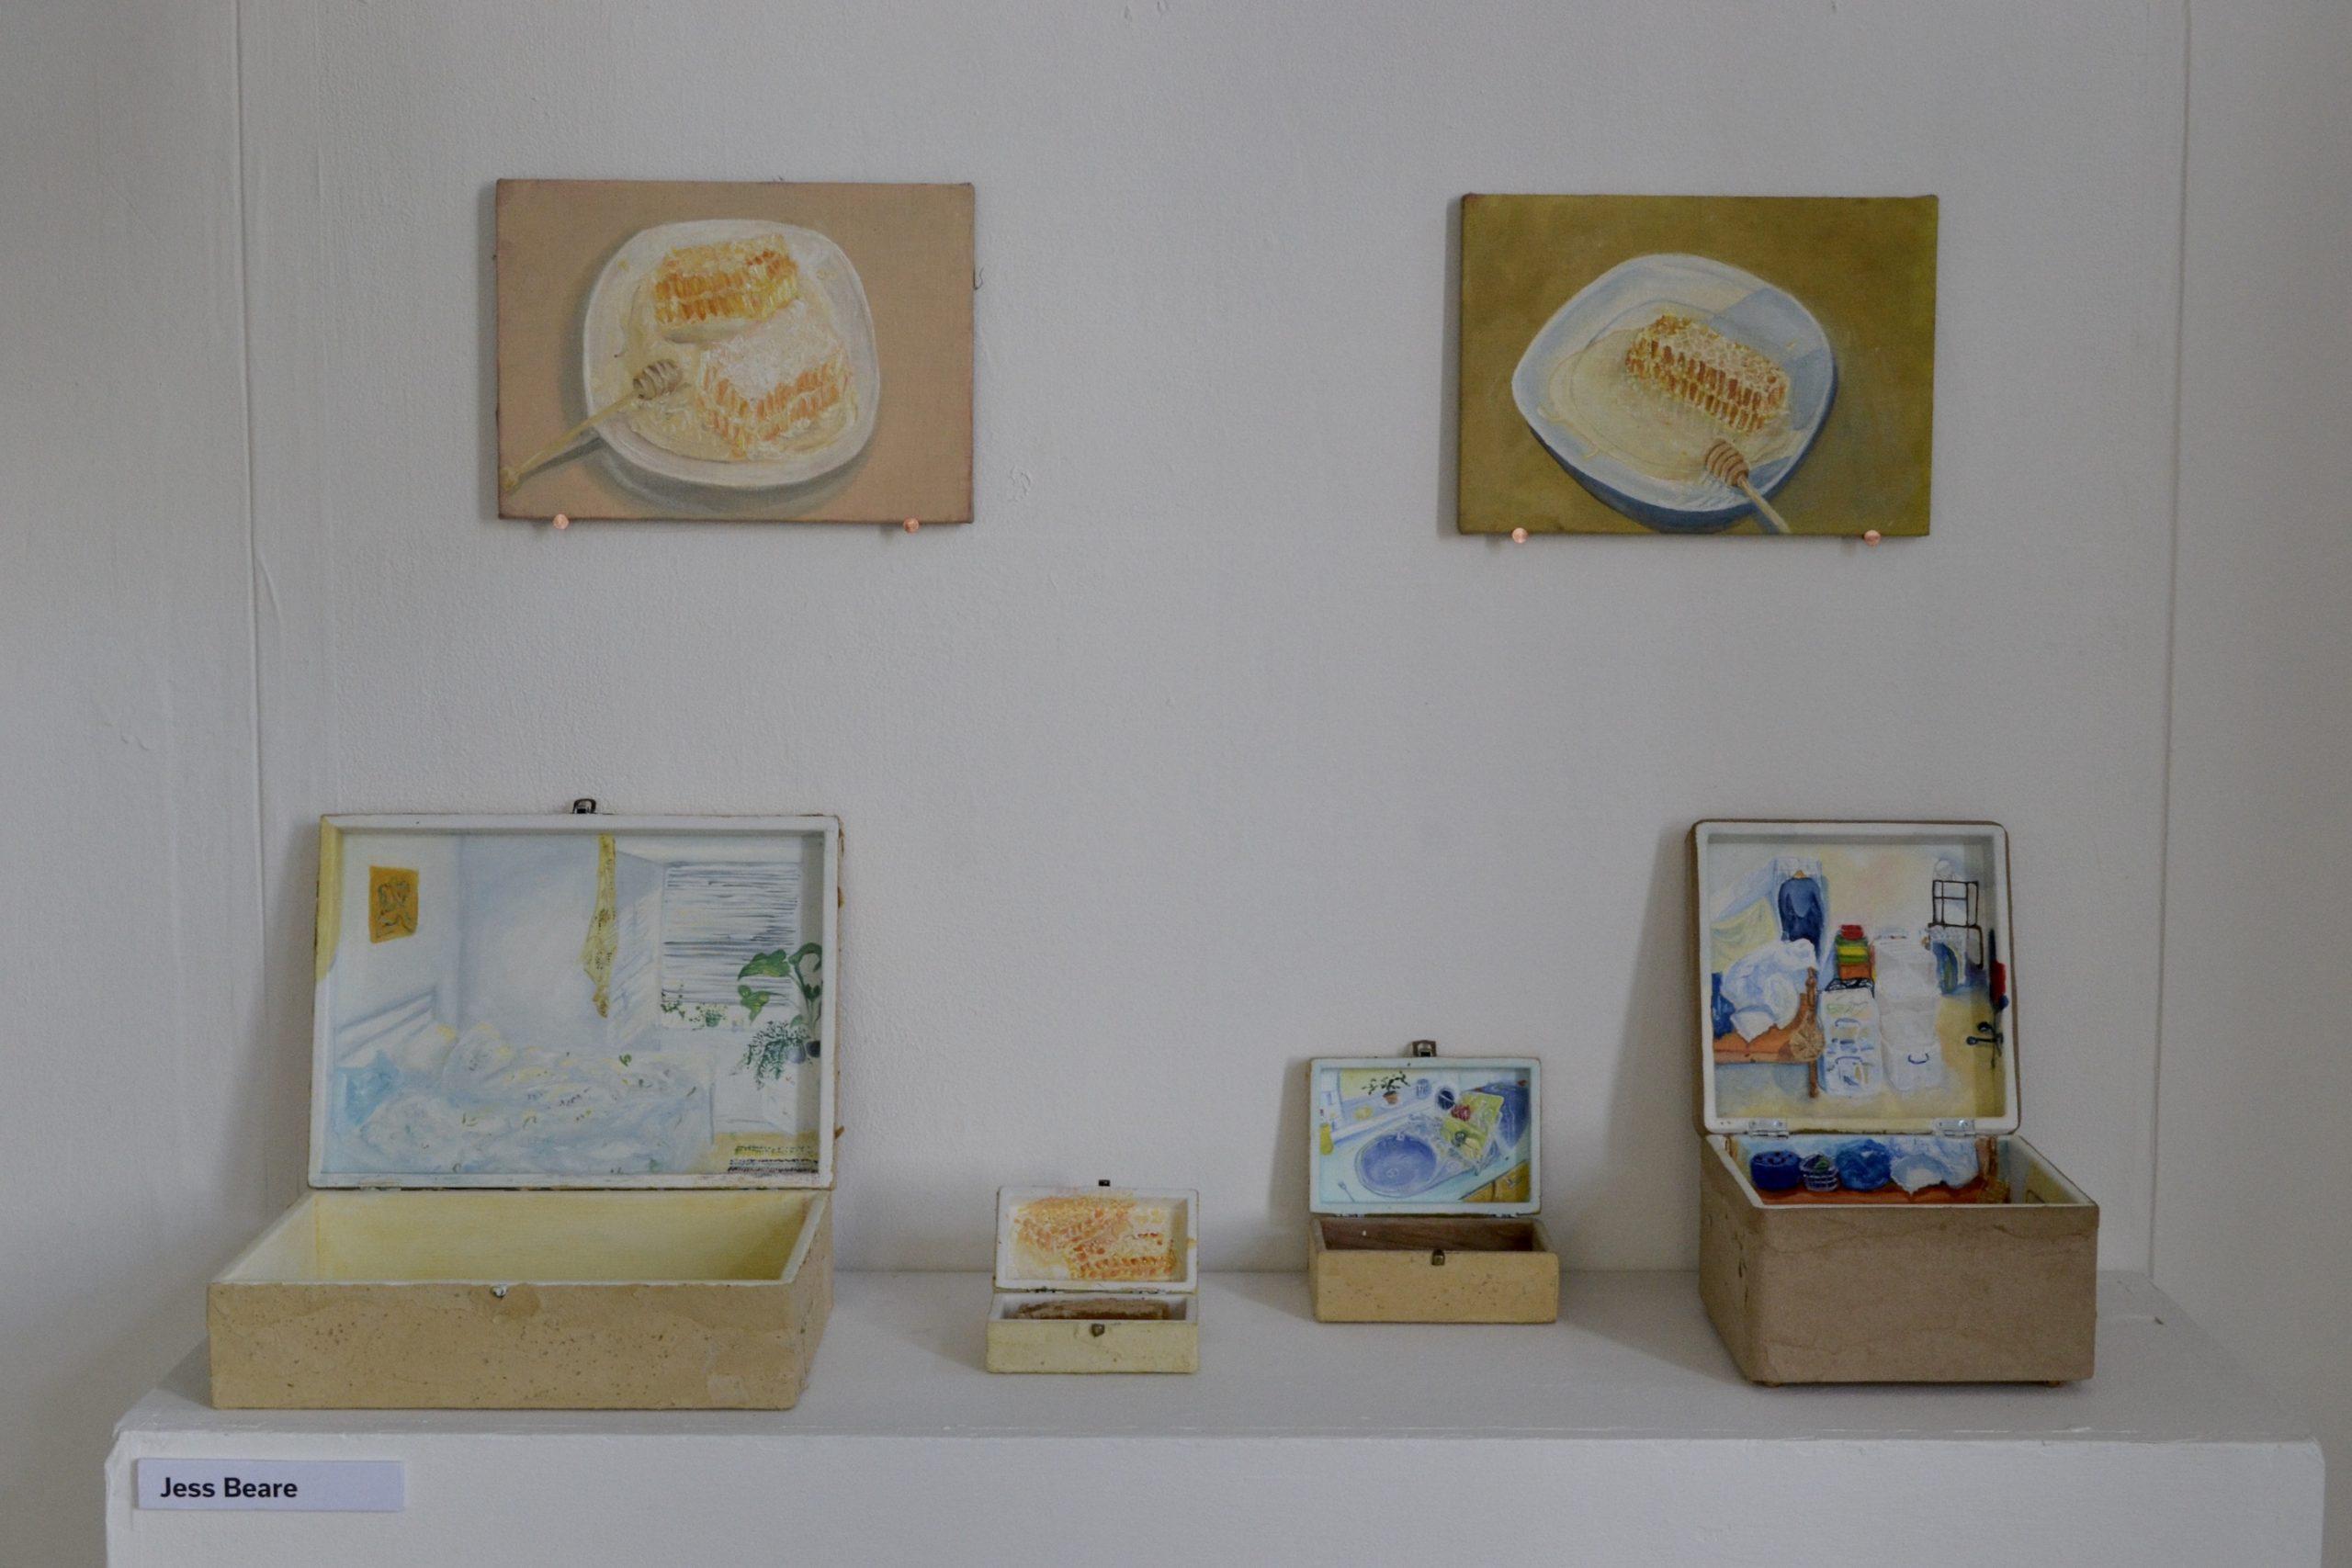 JessBeare Honey Paintings Box Rooms FineArt .jpeg